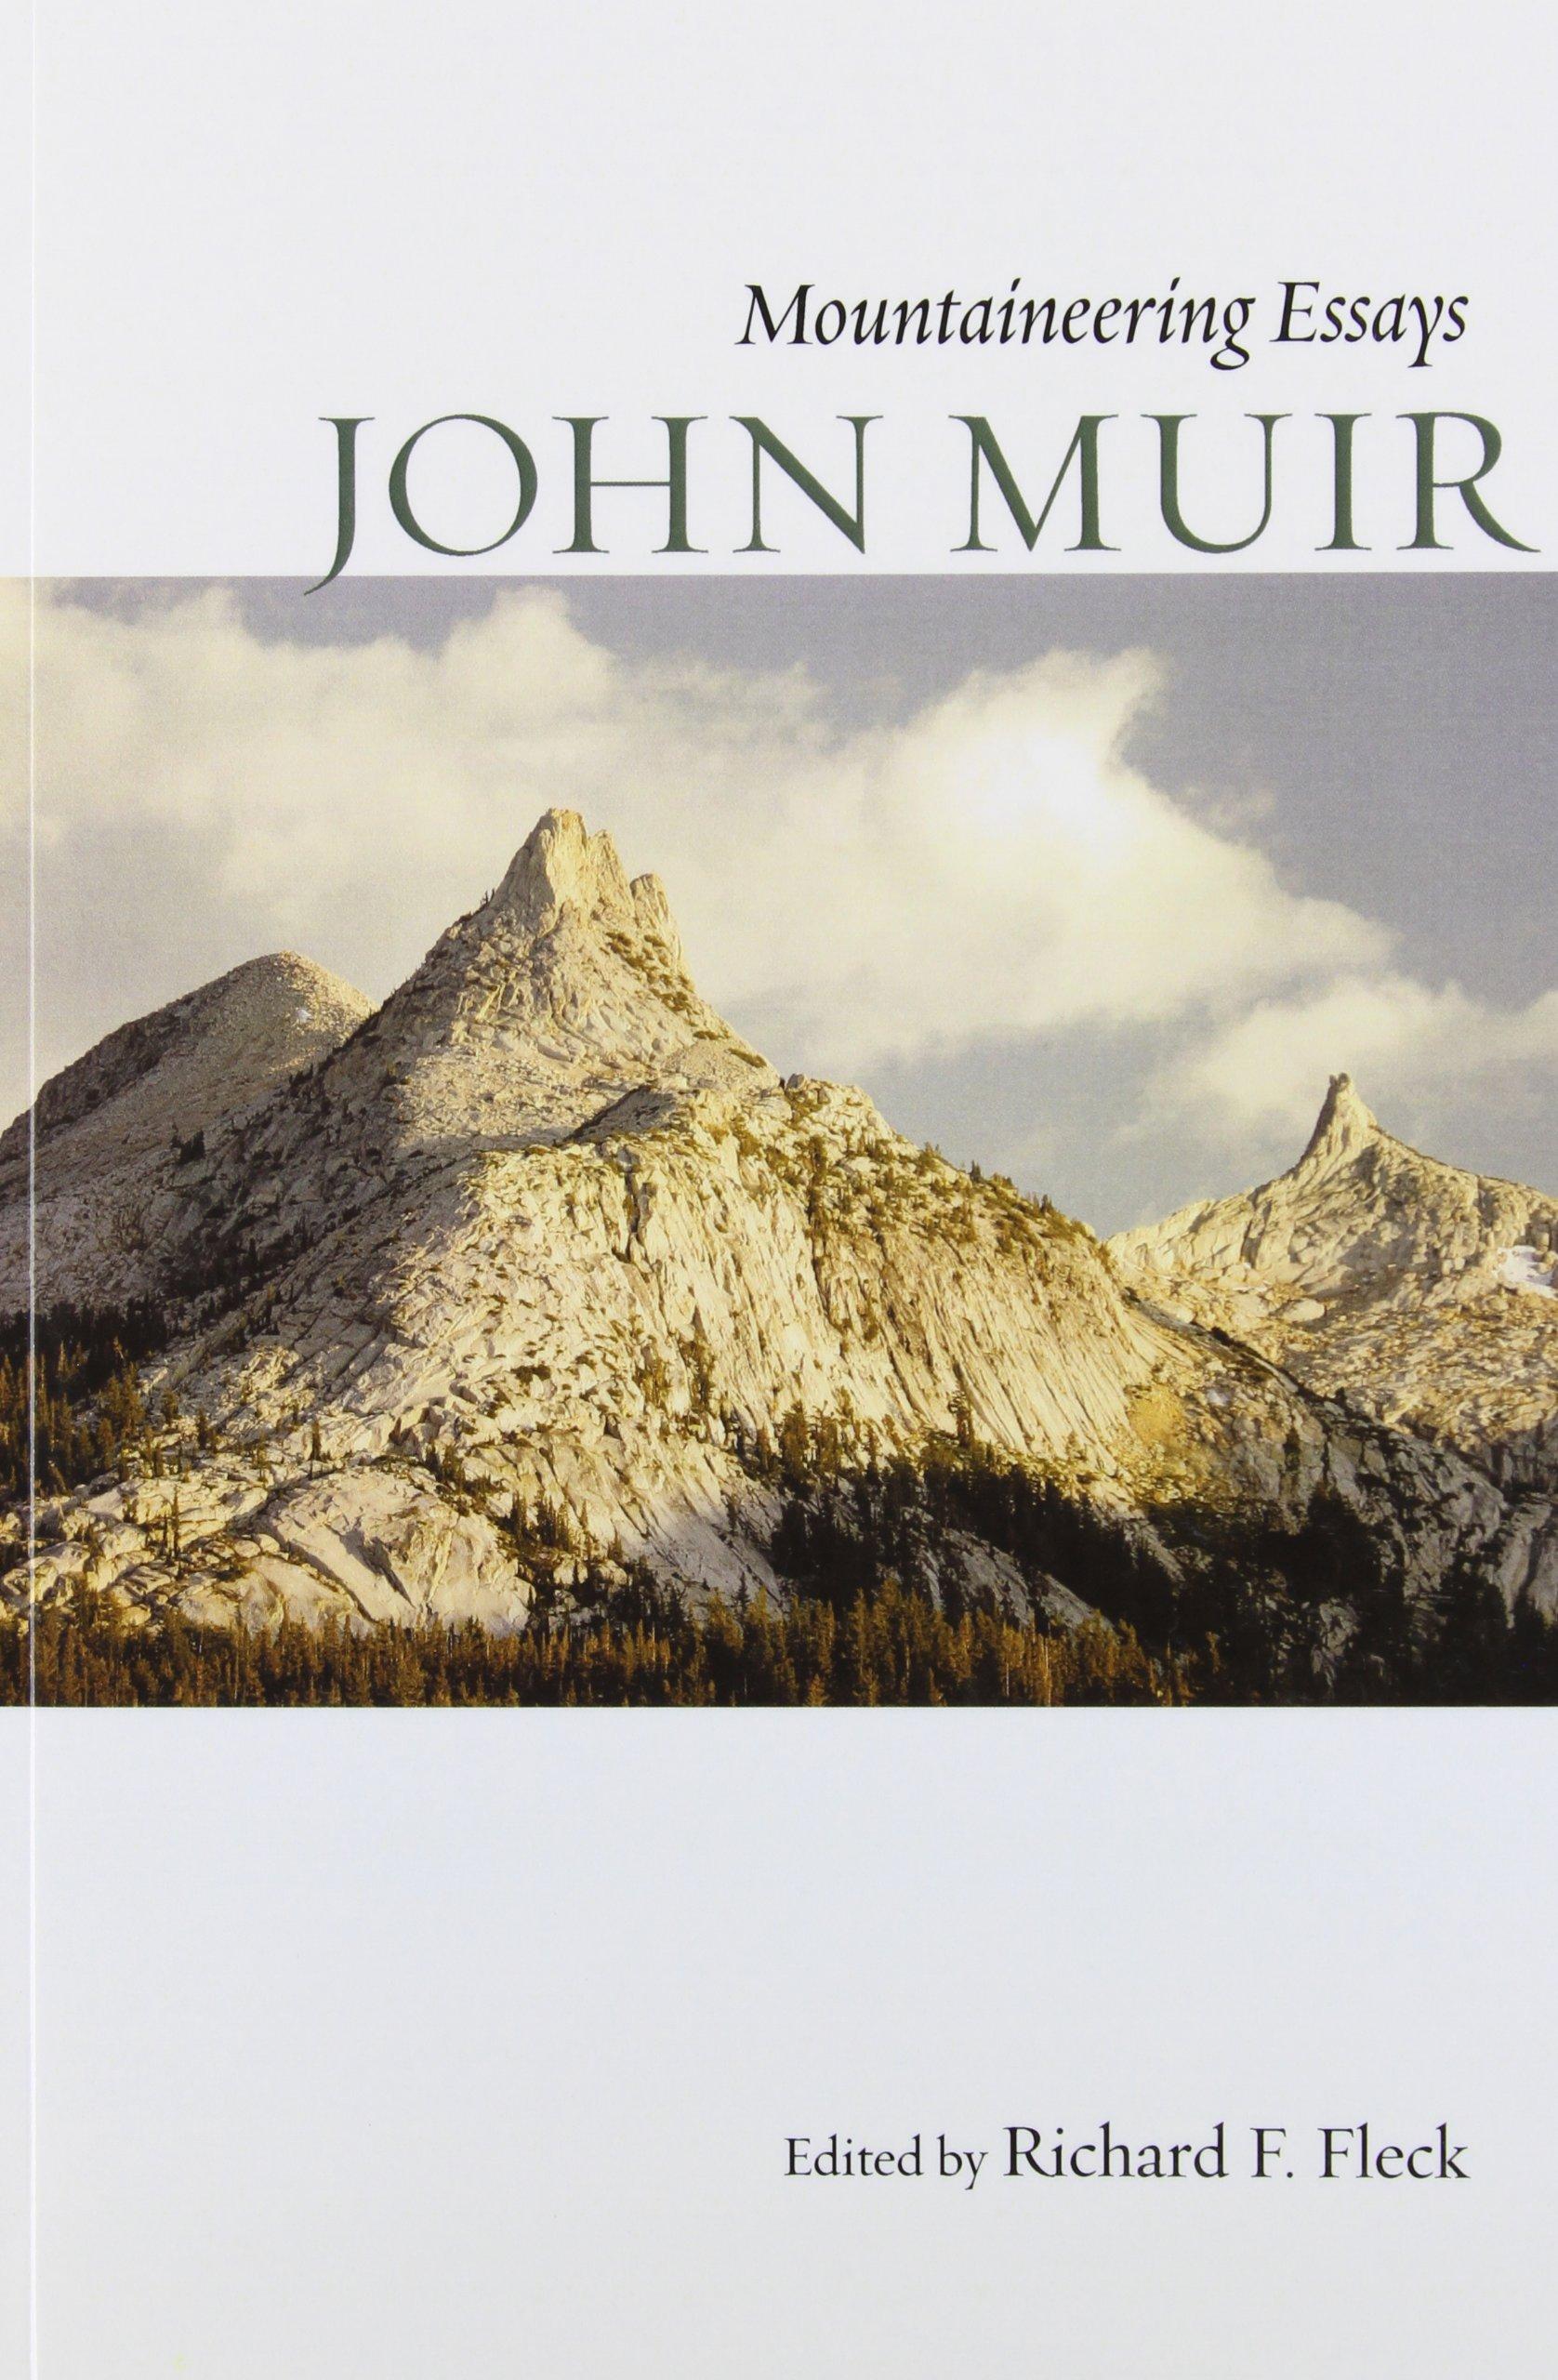 018 817oif2bioml John Muir Wilderness Essays Essay Best Pdf Review Full